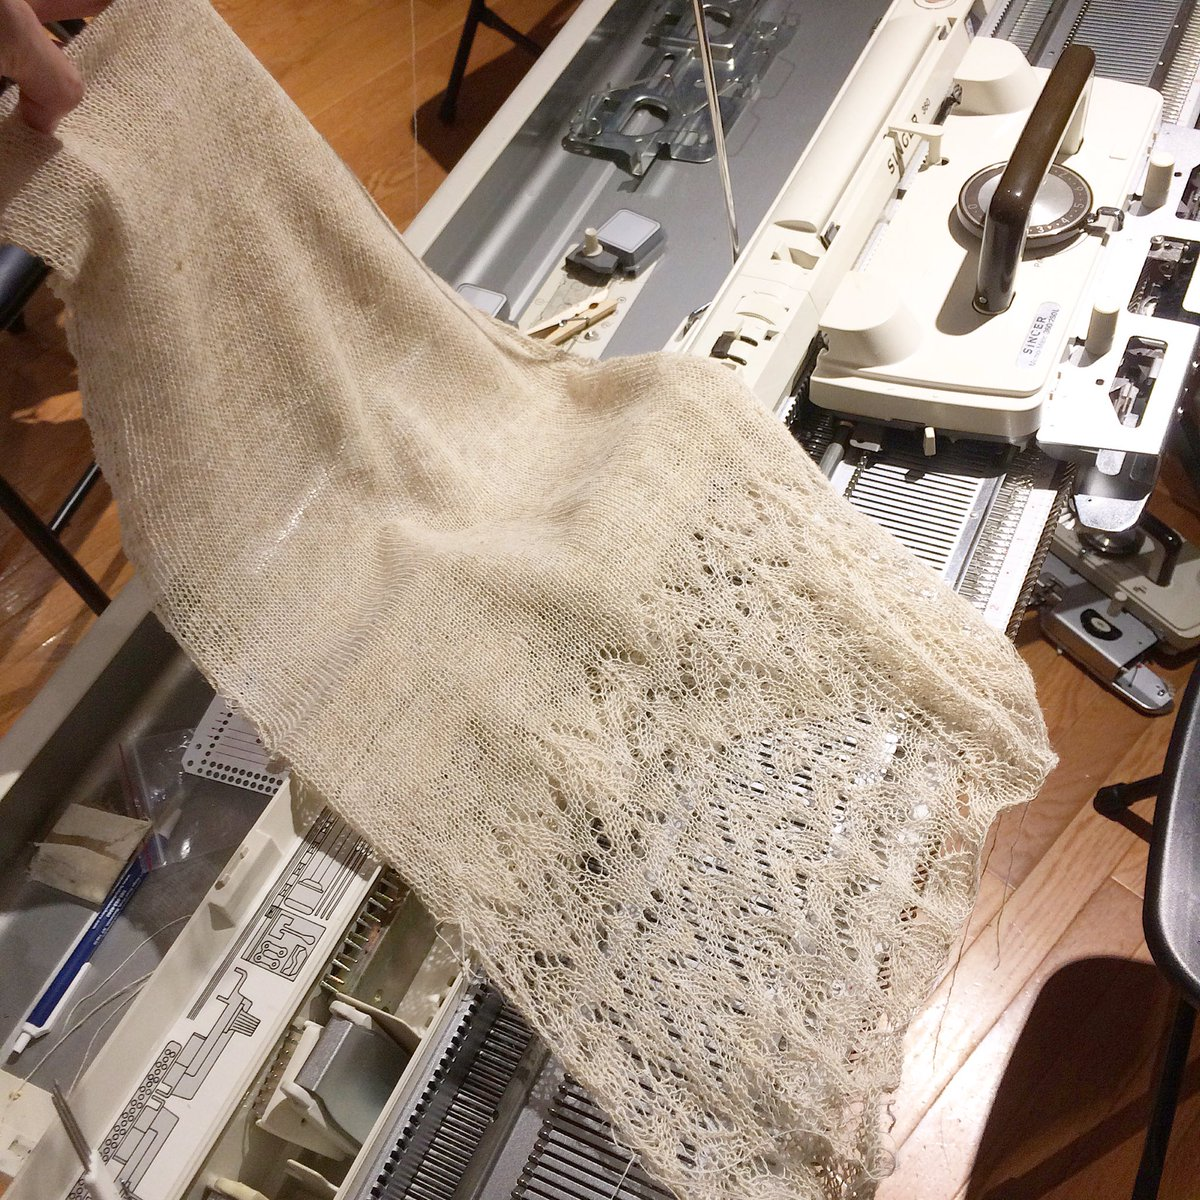 This beautiful scarf was knitted up during Machine Knitting Club last night! #knittingmachine #knit #knitting #knittingclub #rochesterny <br>http://pic.twitter.com/1VdOjFDDyk